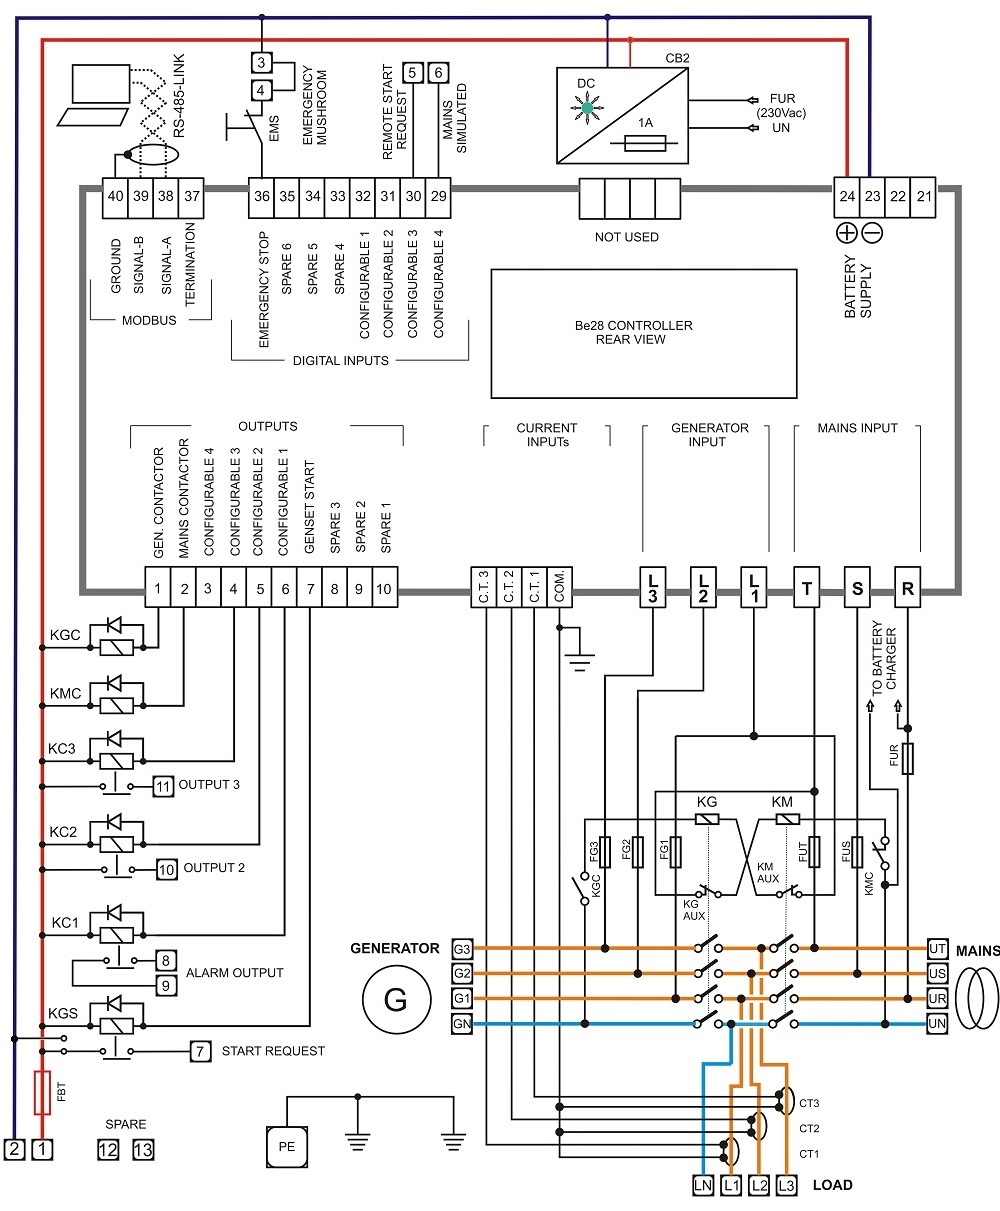 Charming Onan Generator Wiring Schematic making diagrams